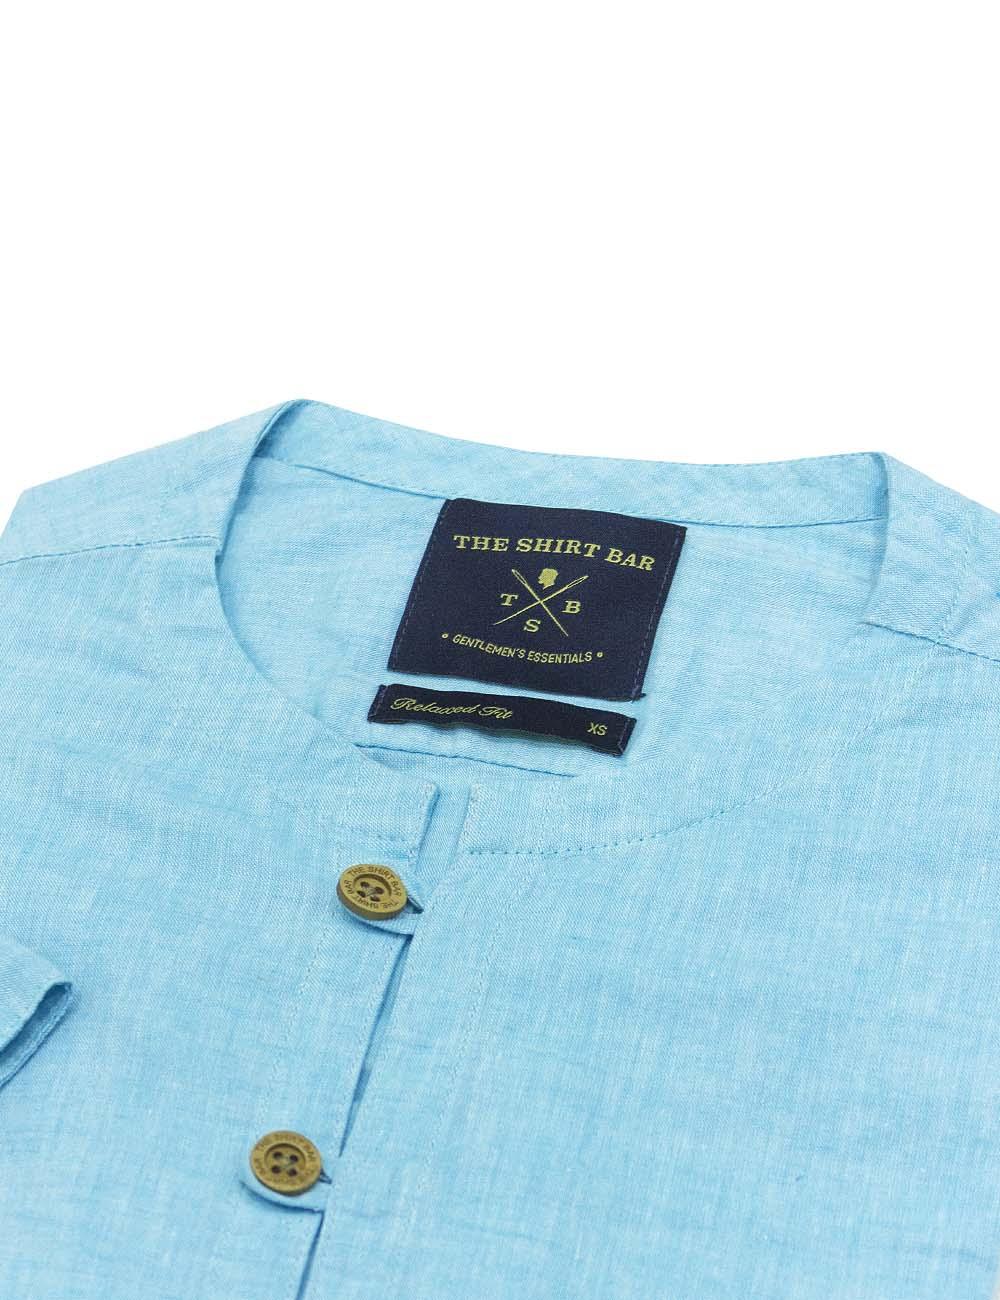 Turquoise Linen Mandarin Collar Half Placket Custom / Relaxed Fit Short Sleeve Shirt – RF39S2.19